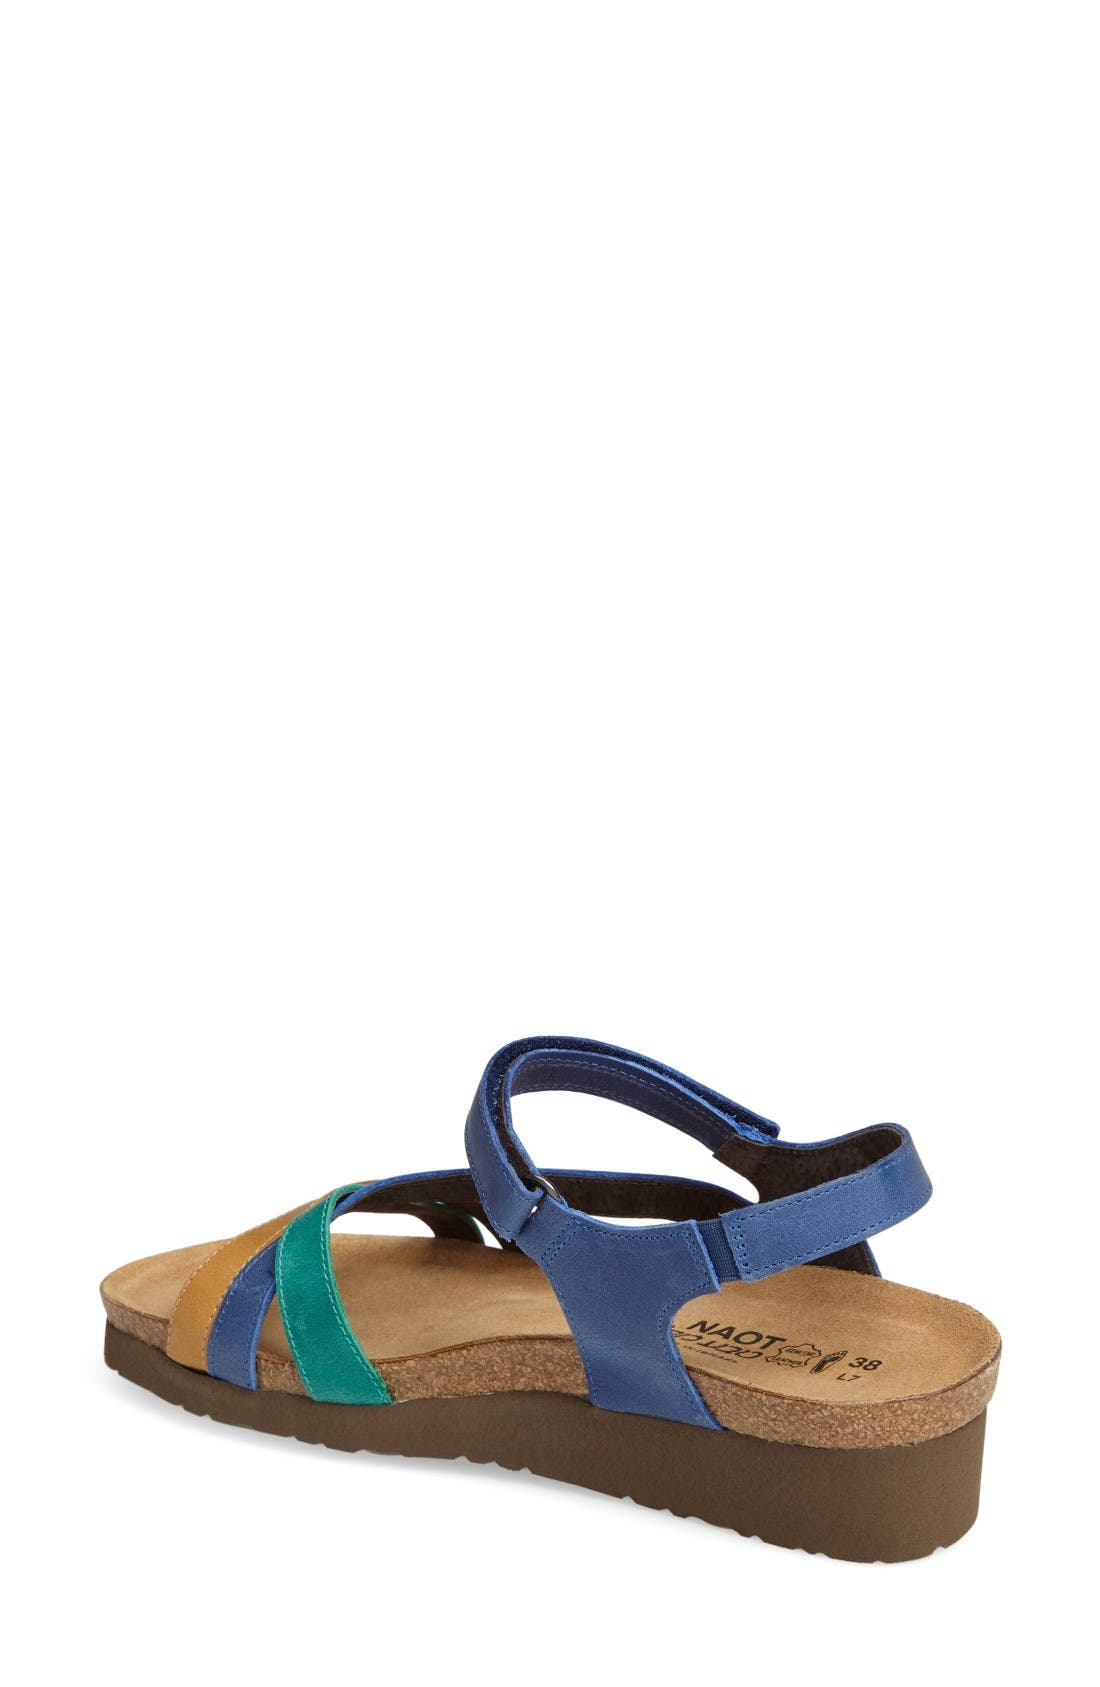 'Sophia' Sandal,                             Alternate thumbnail 2, color,                             Blue/ Brown Nubuck Leather